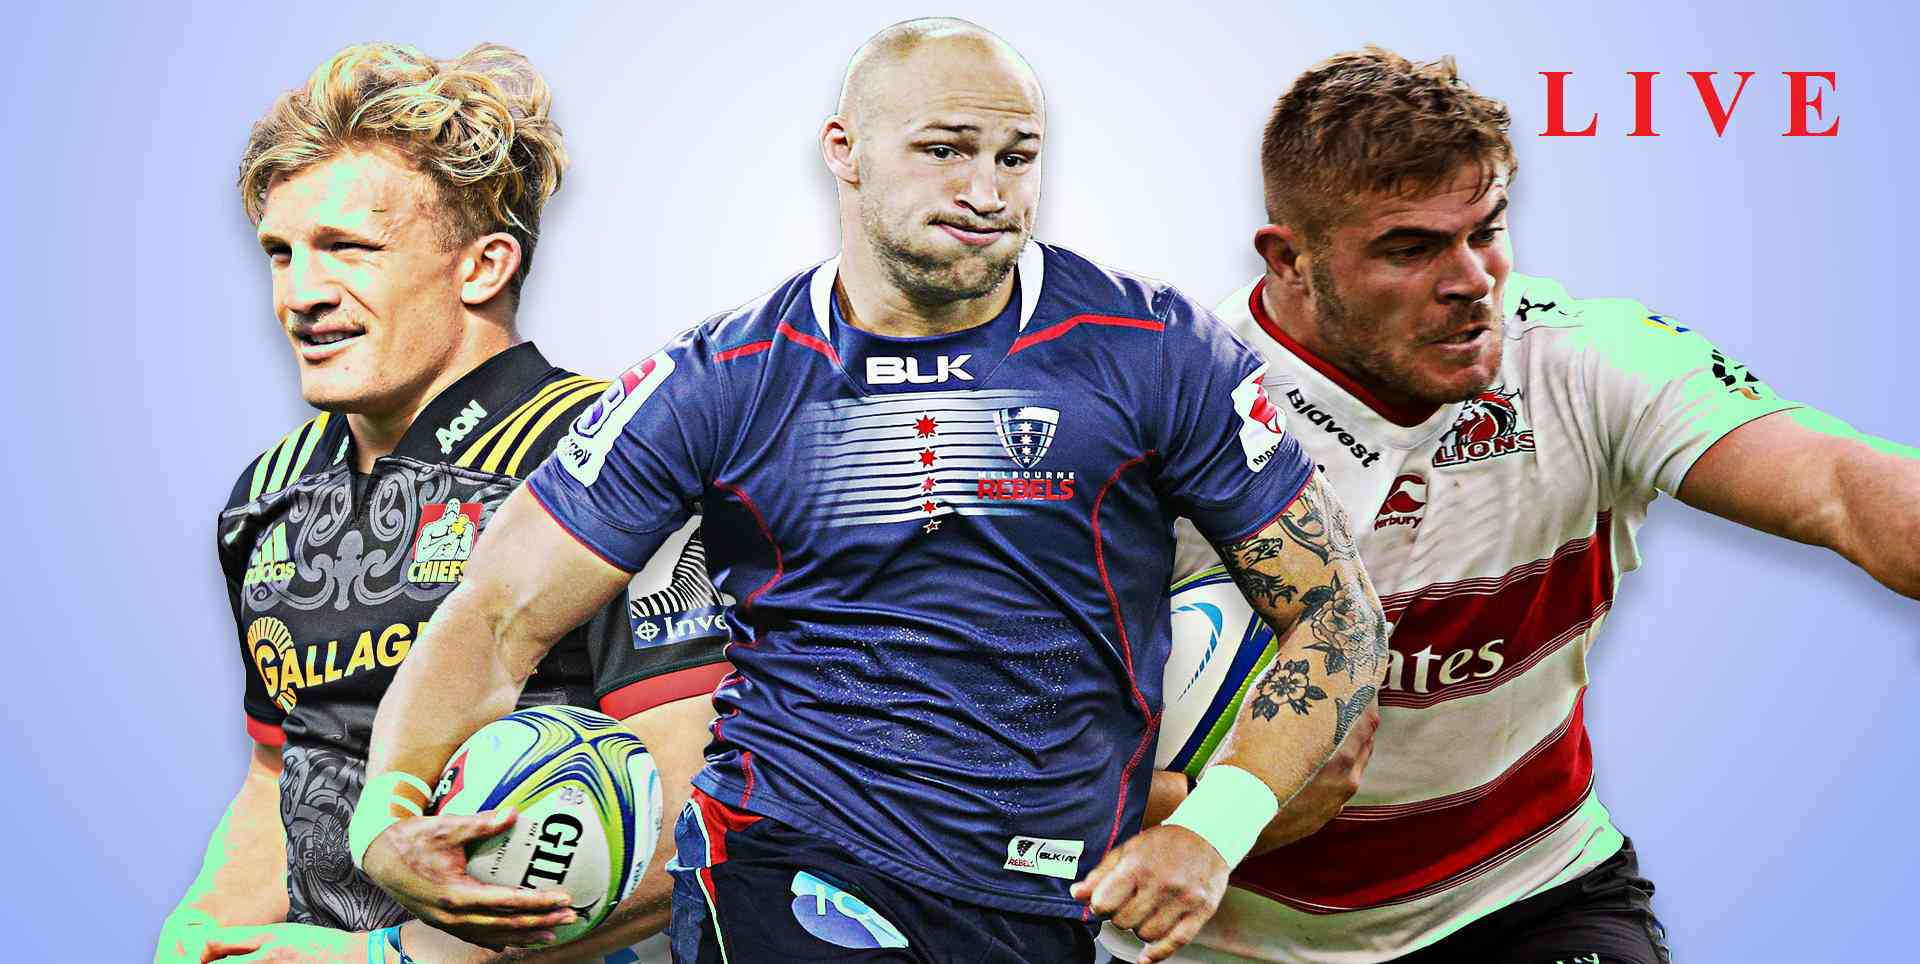 watch-la-rochelle-vs-edinburgh-rugby-live